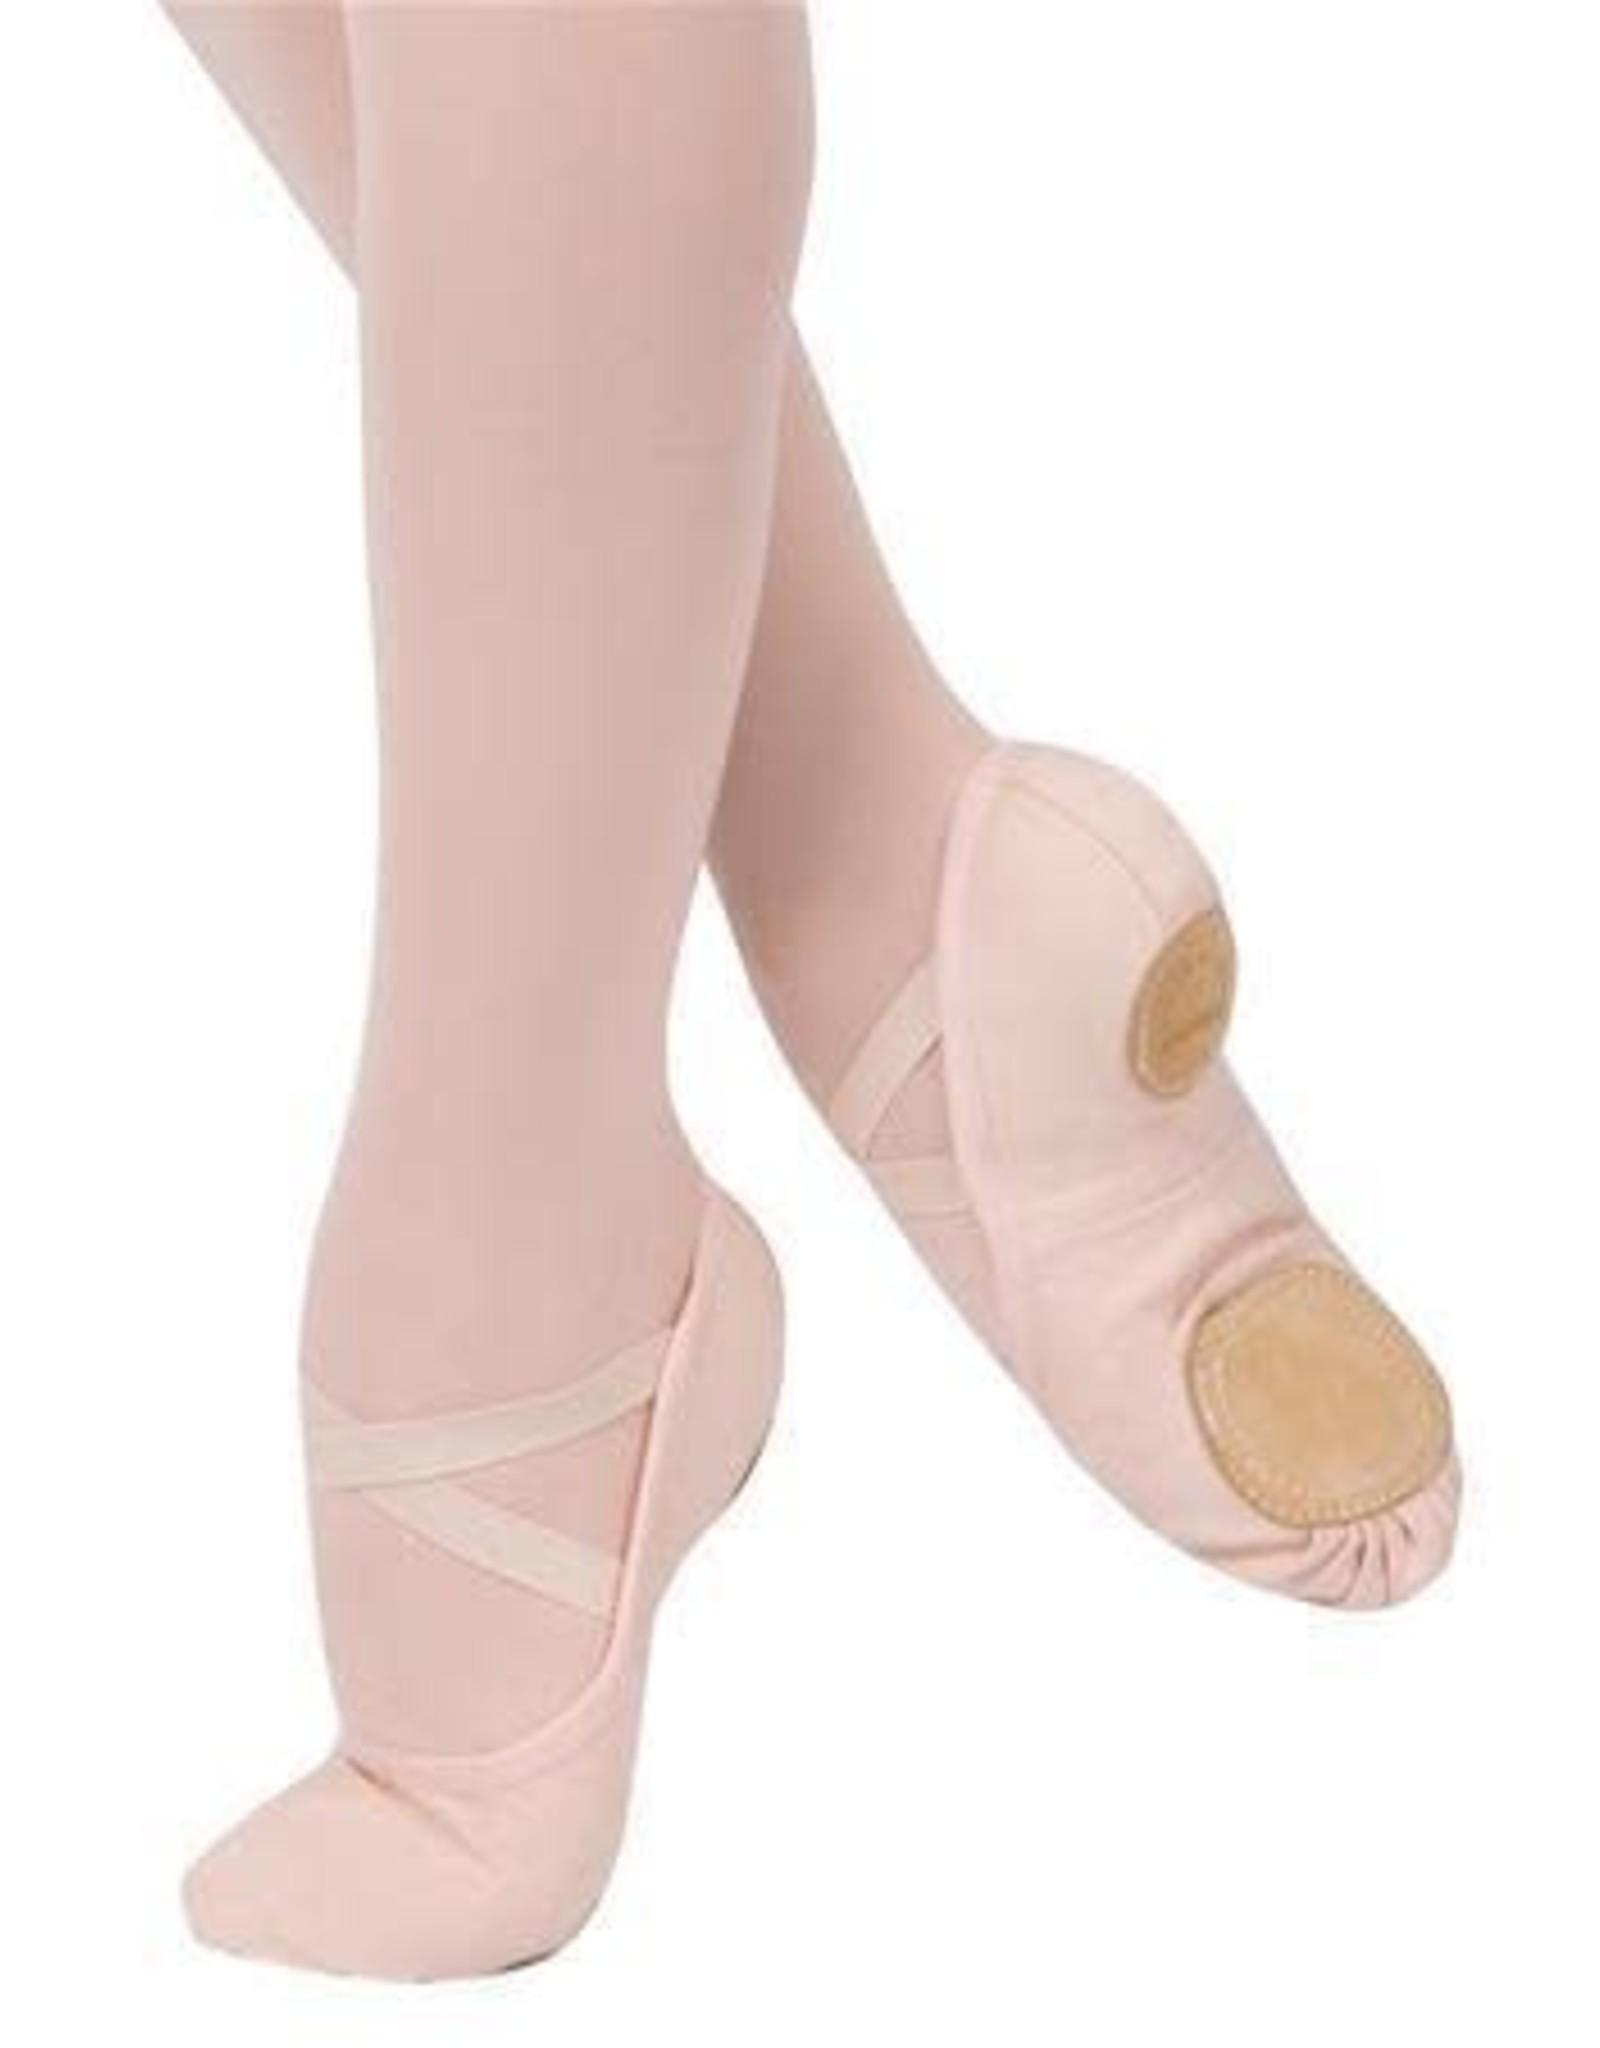 Nikolay Nikolay Dream Stretch Ballet Shoes